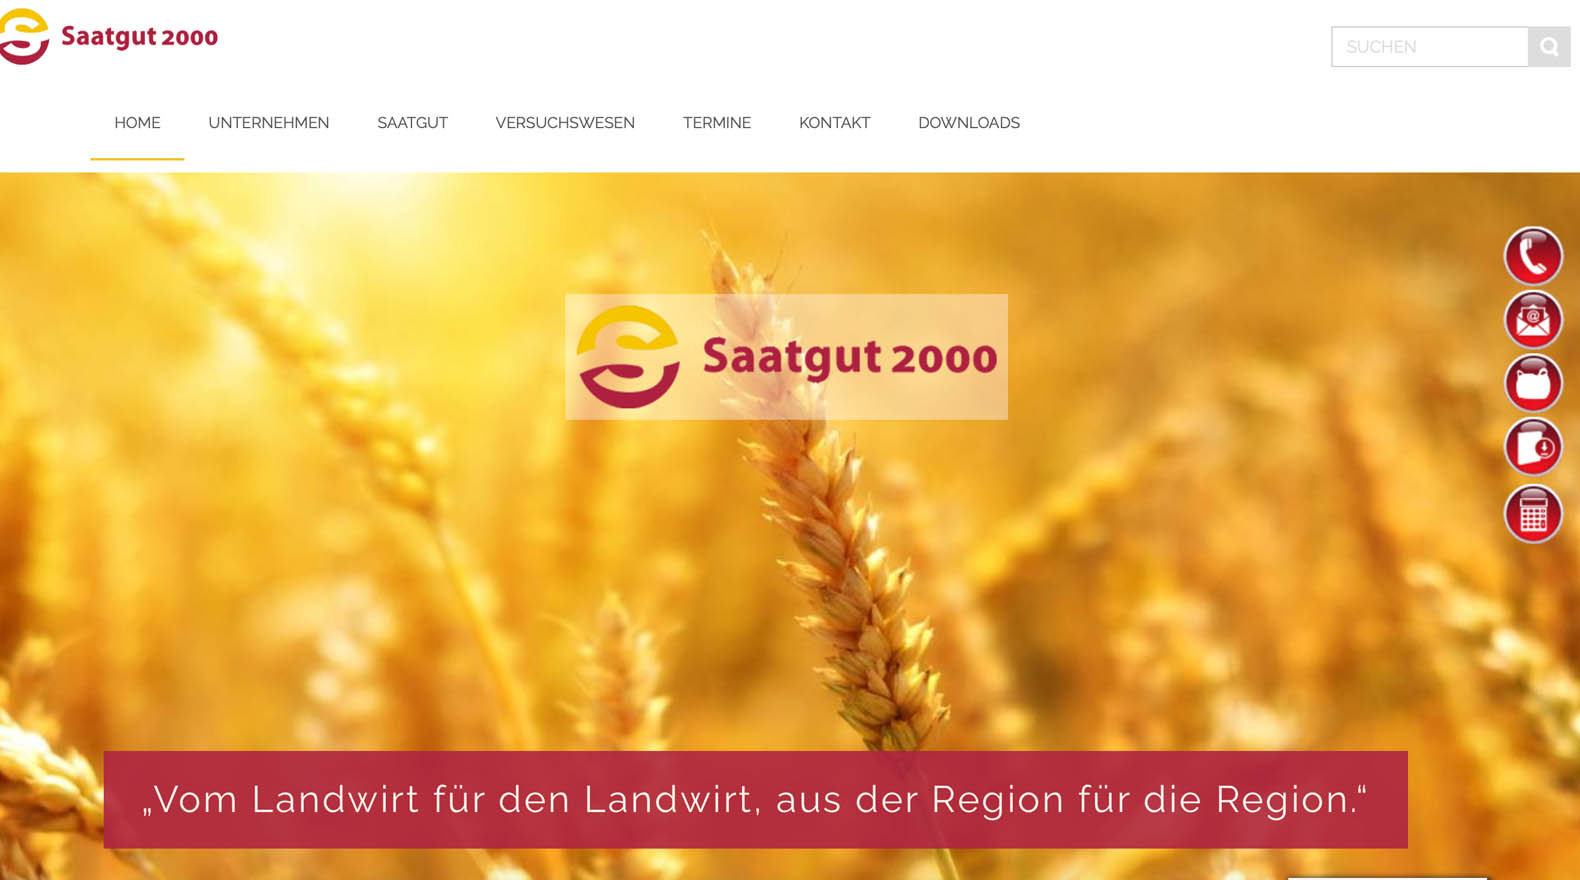 webprojekt-chemnitz-referenz-silotech-saatgut